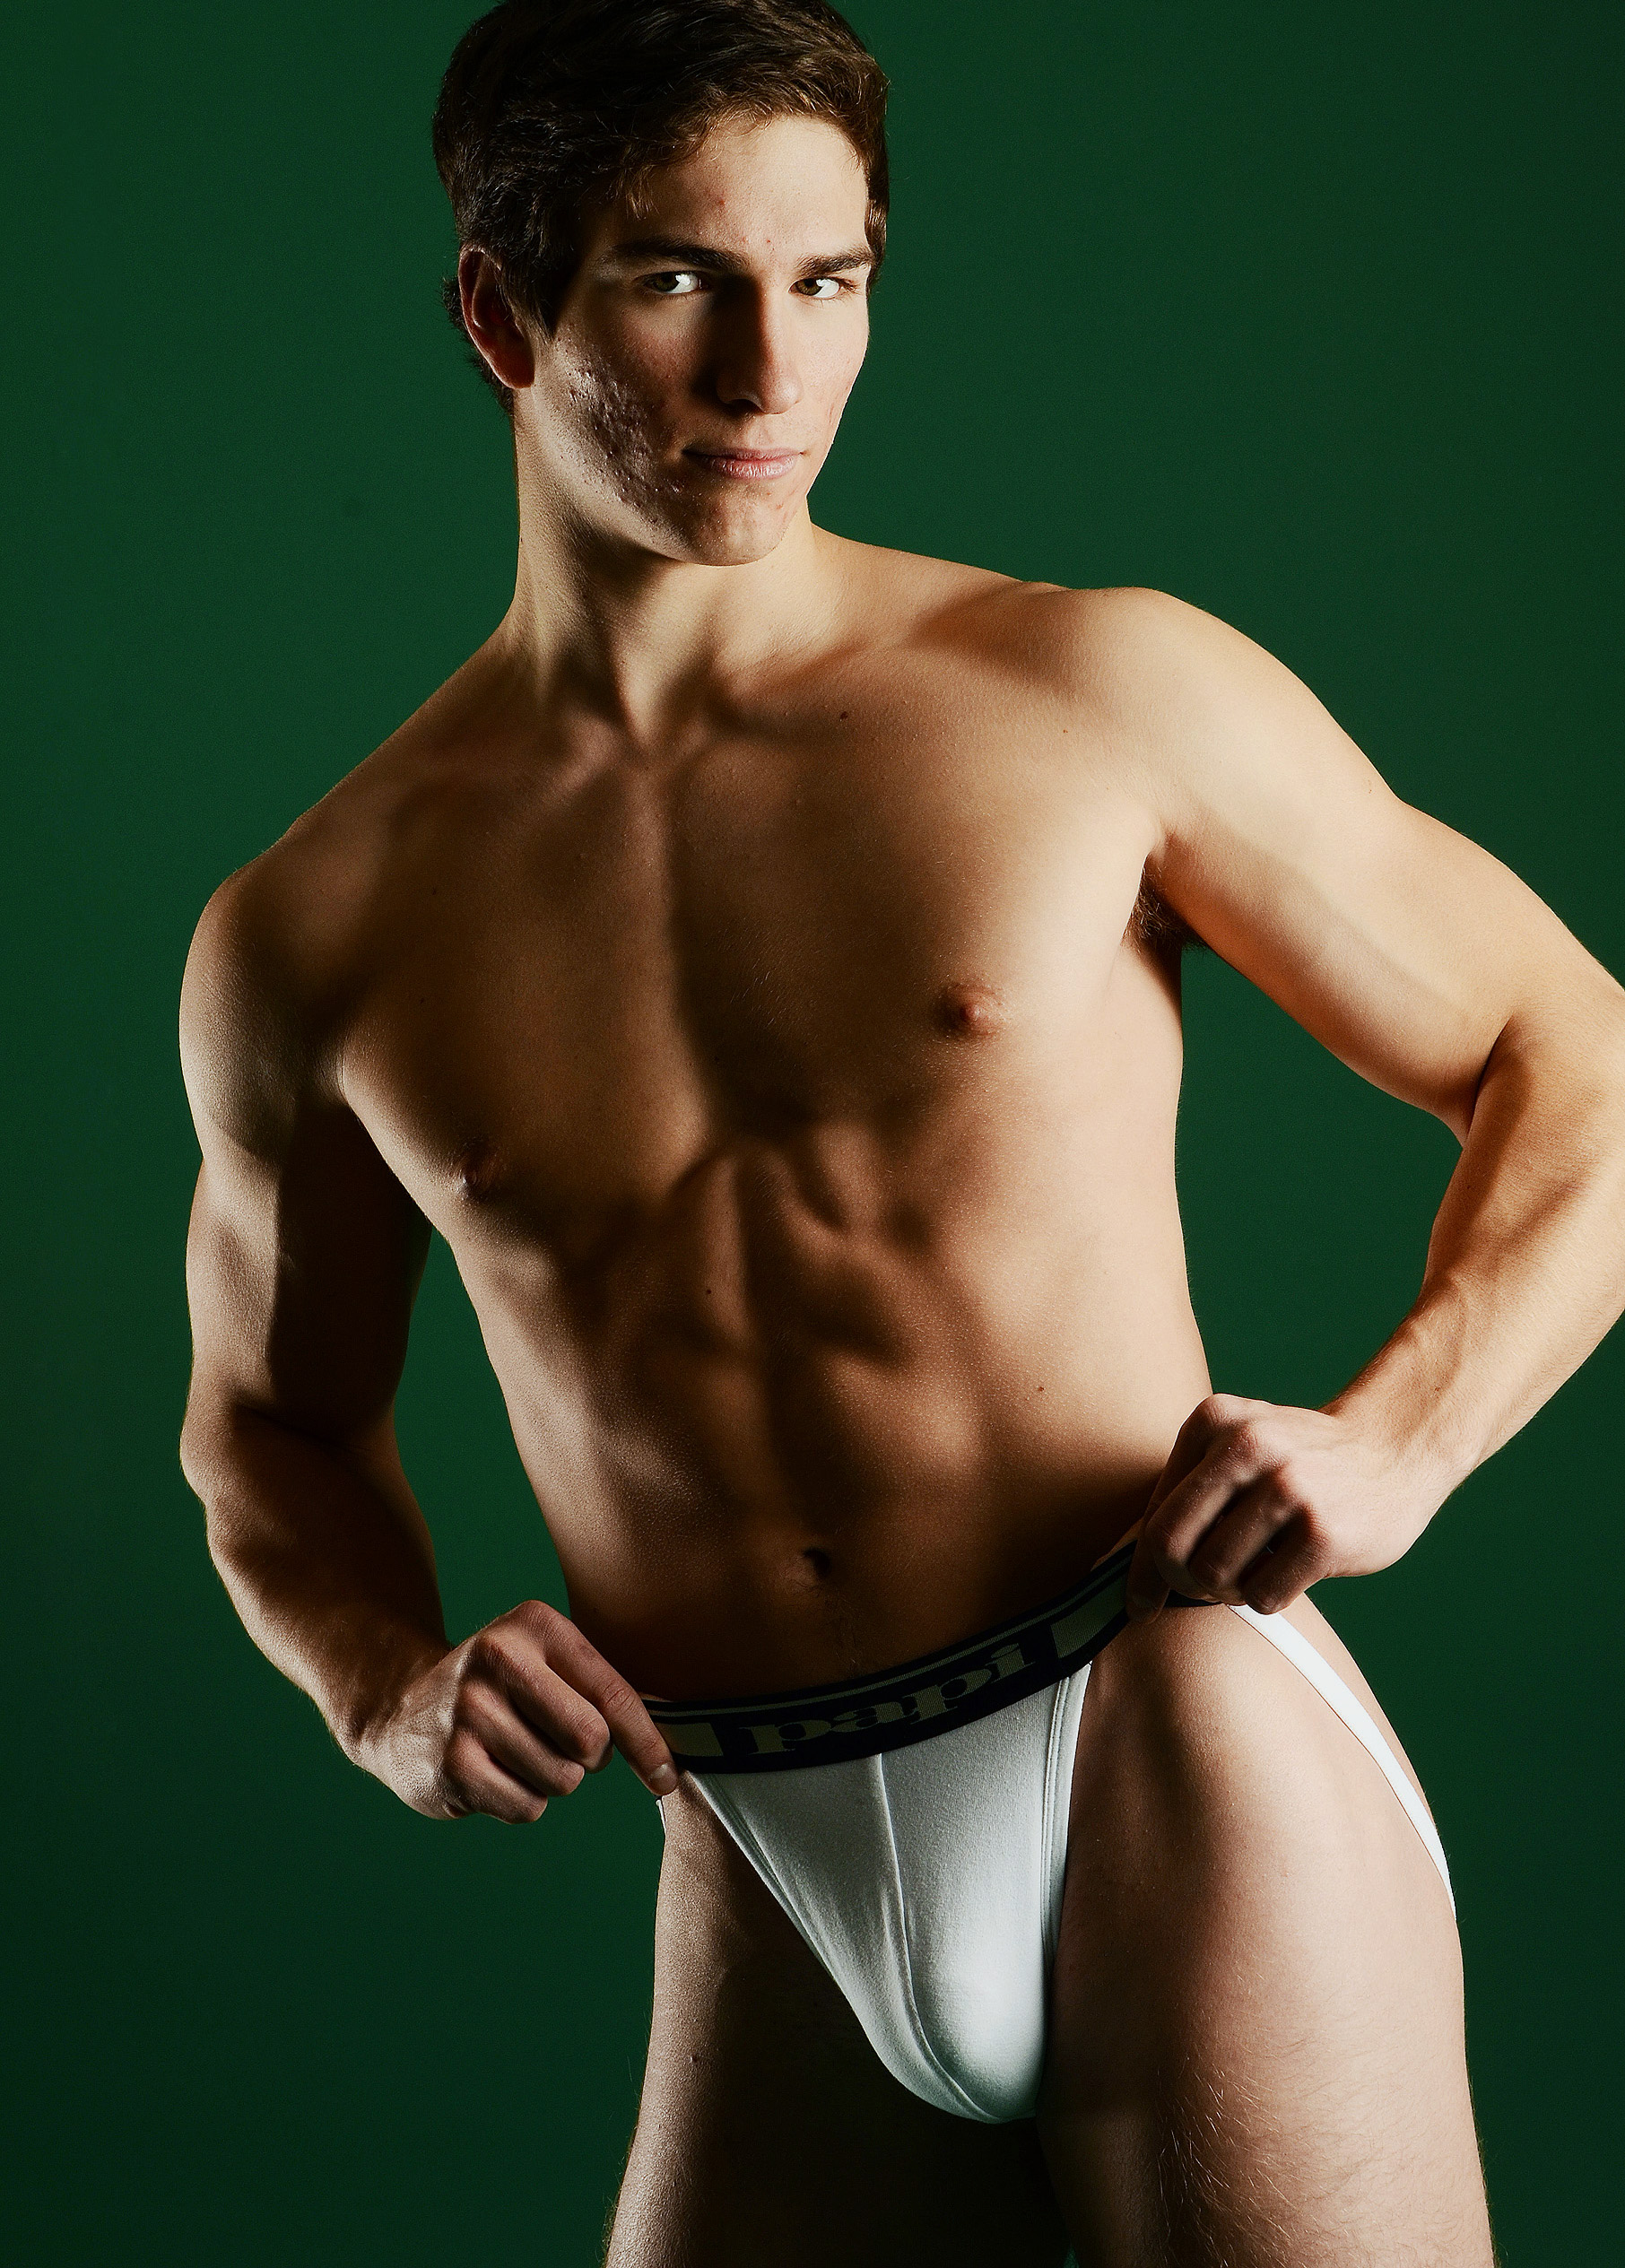 ModelTeenz Ryan K